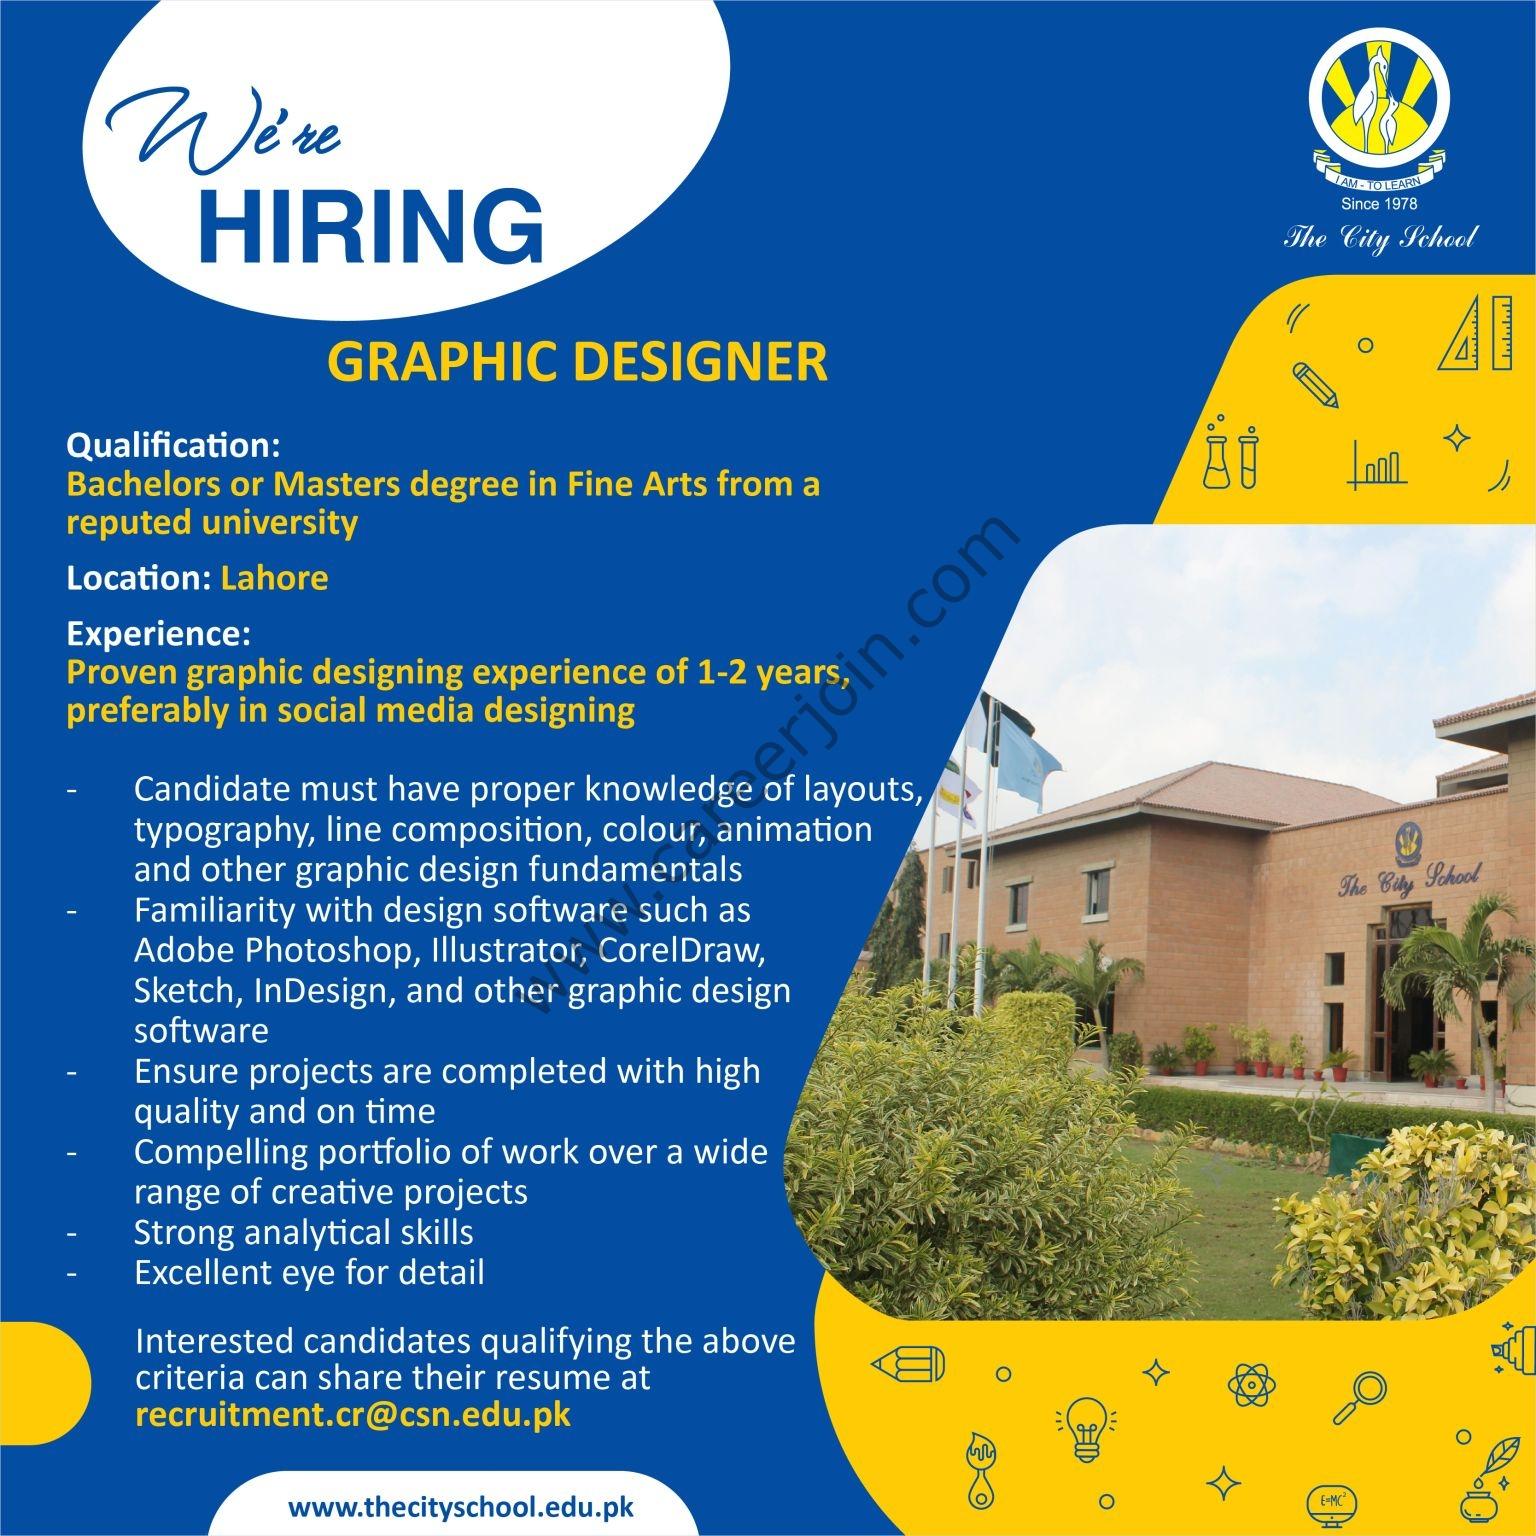 The City School Jobs Graphic Designer